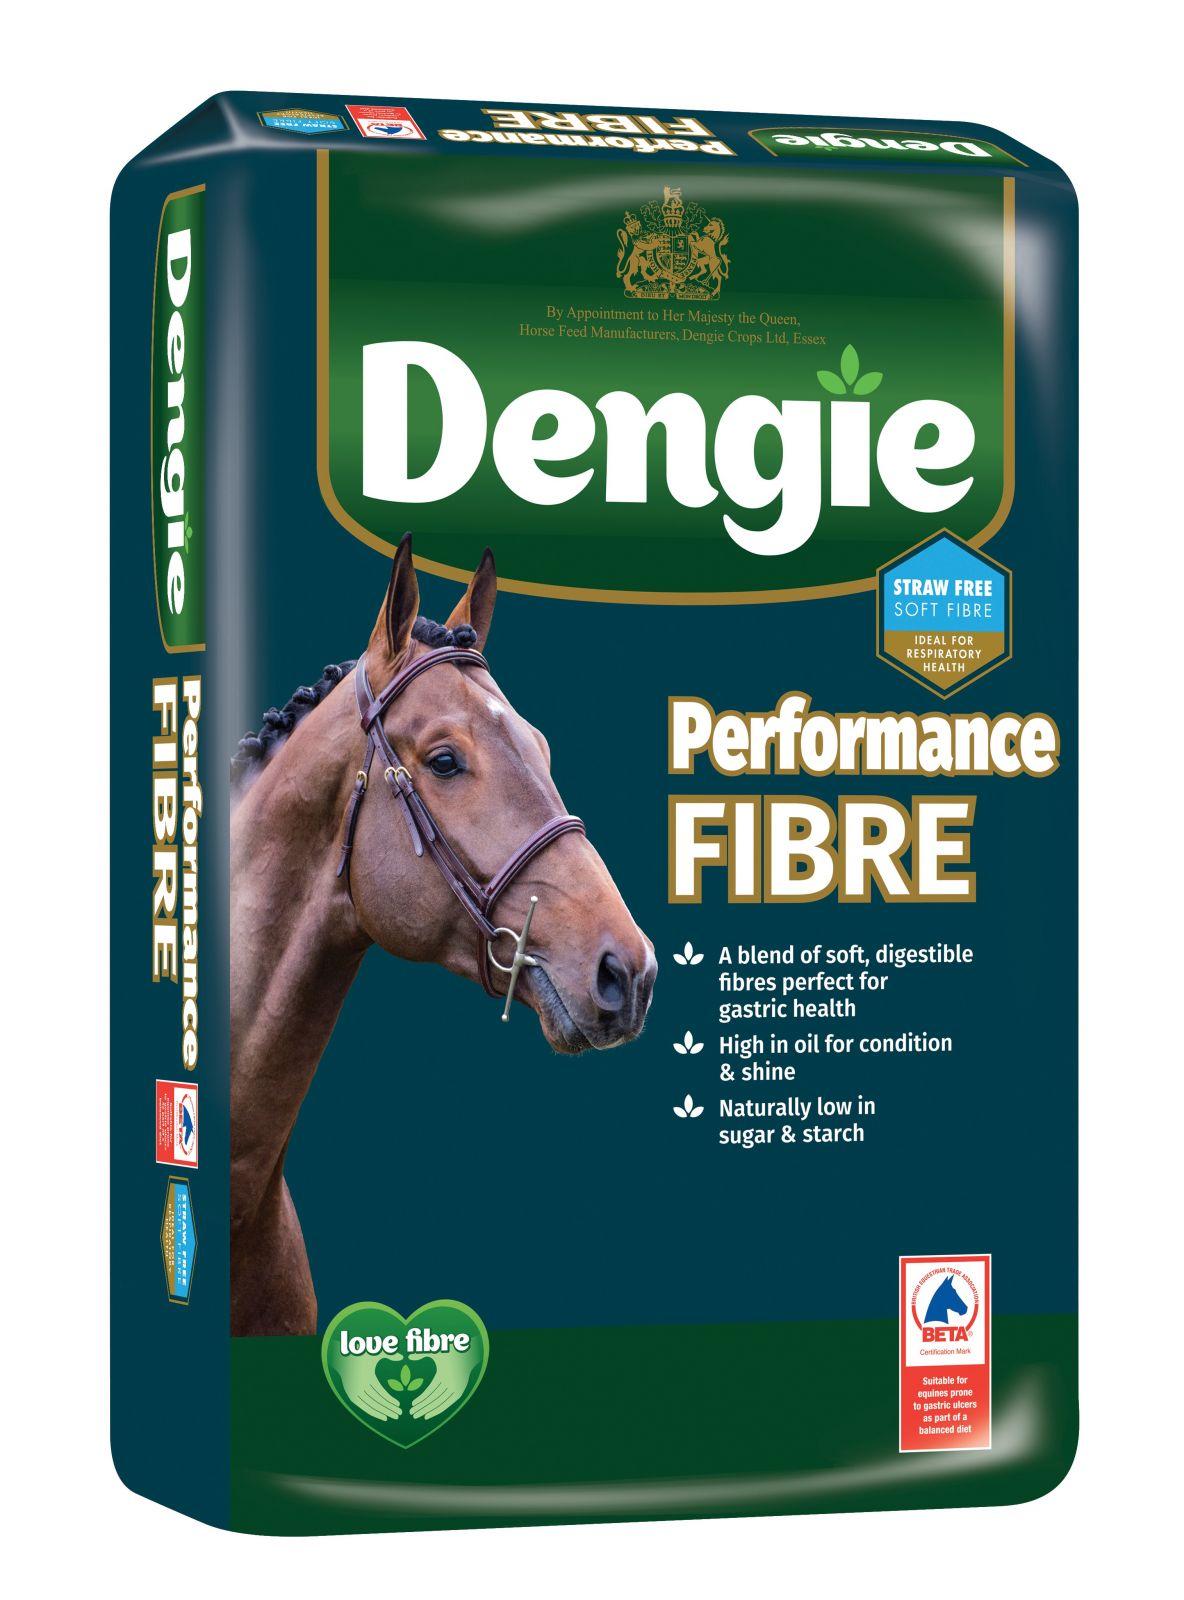 Dengie Performance Fibre